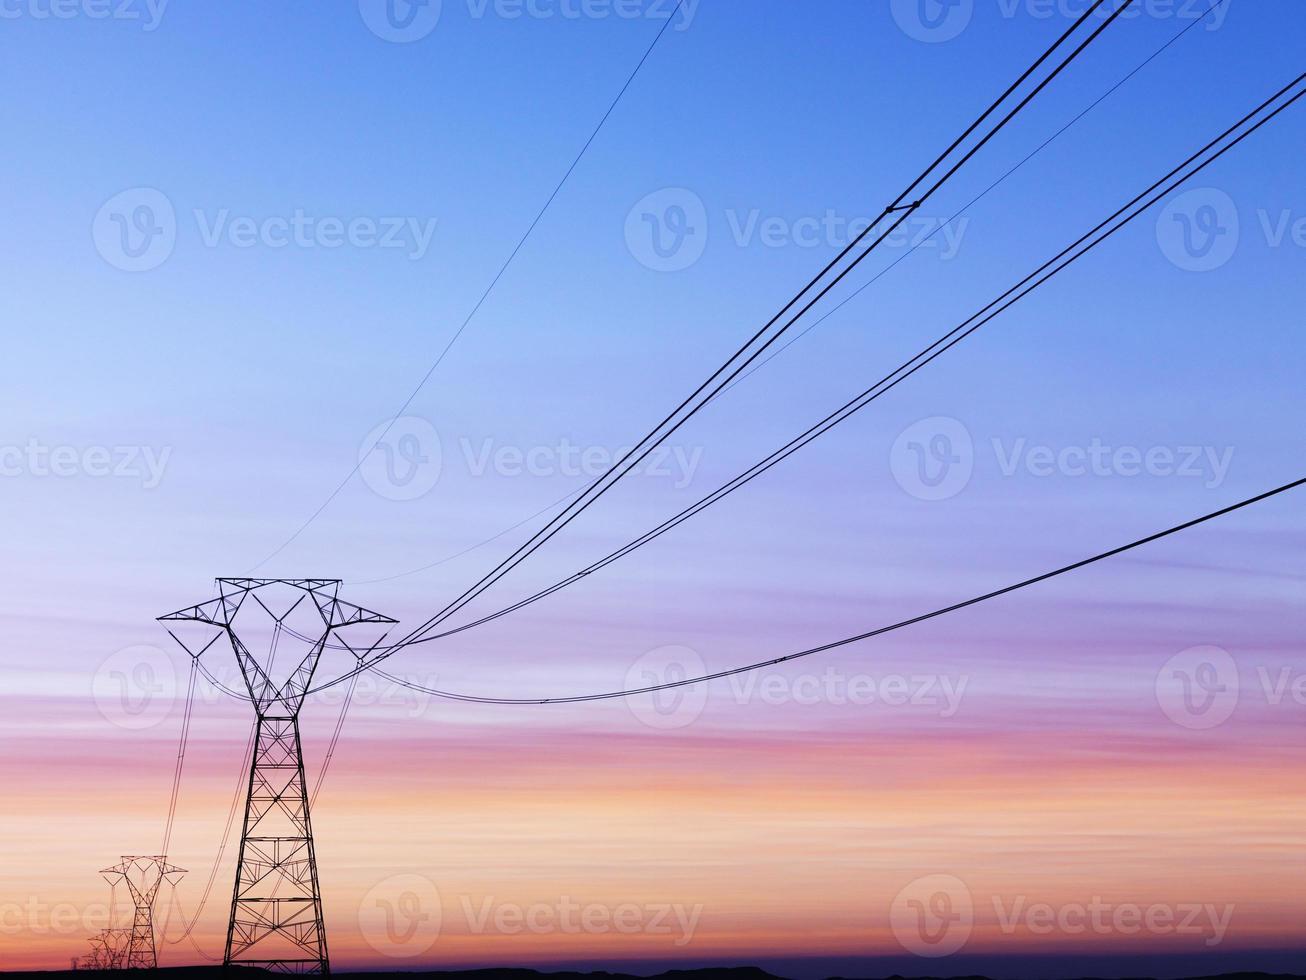 Stromleitungen bei Sonnenuntergang foto